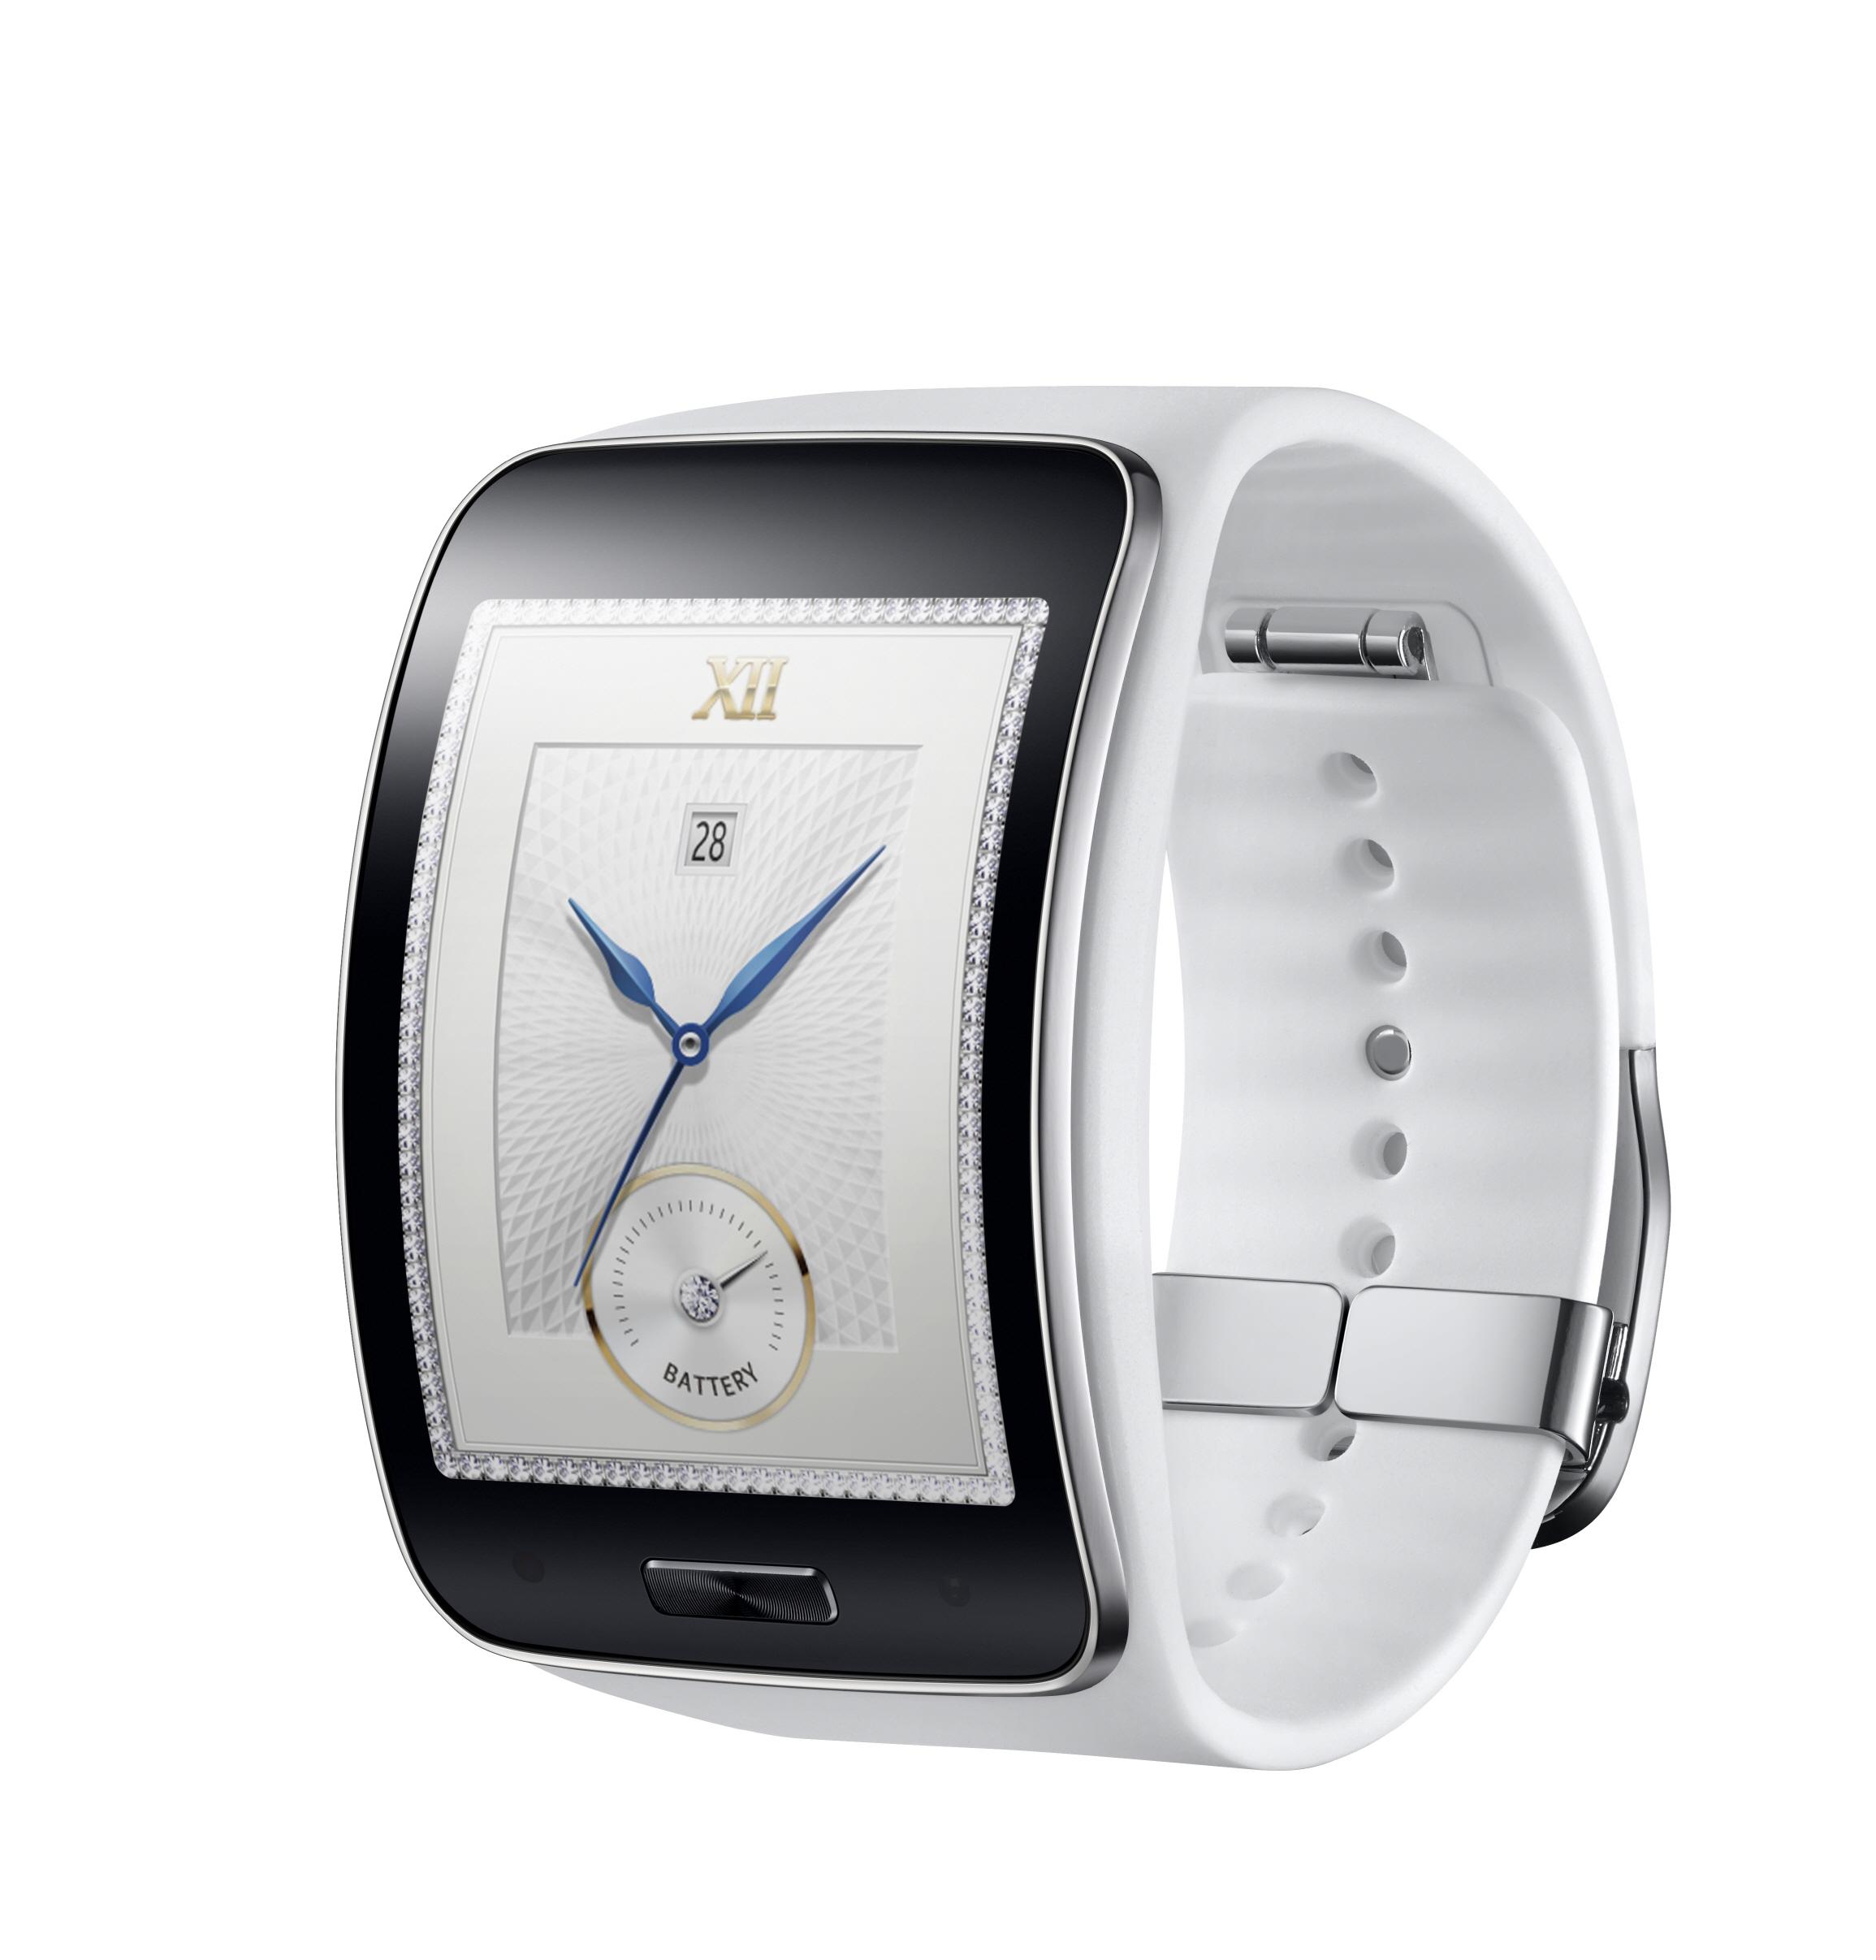 Samsung Gear S offiziell vorgestellt